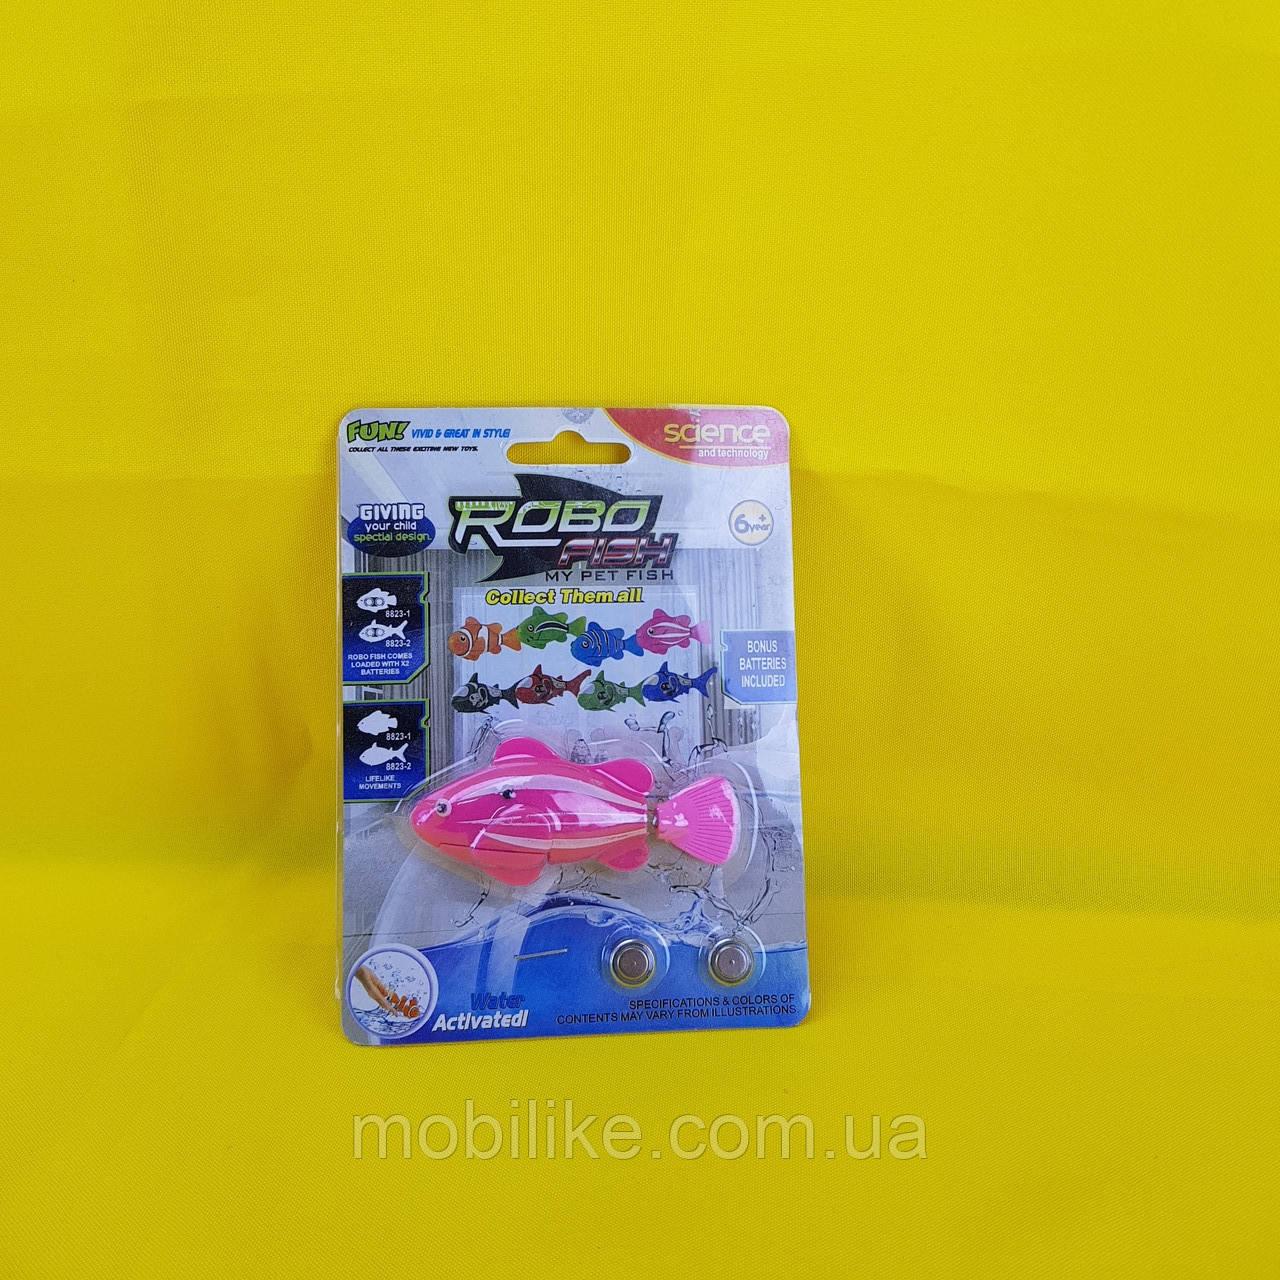 Интерактивная игрушка рыбка робот (робо рыбка) Nano Robo Fish Розовая